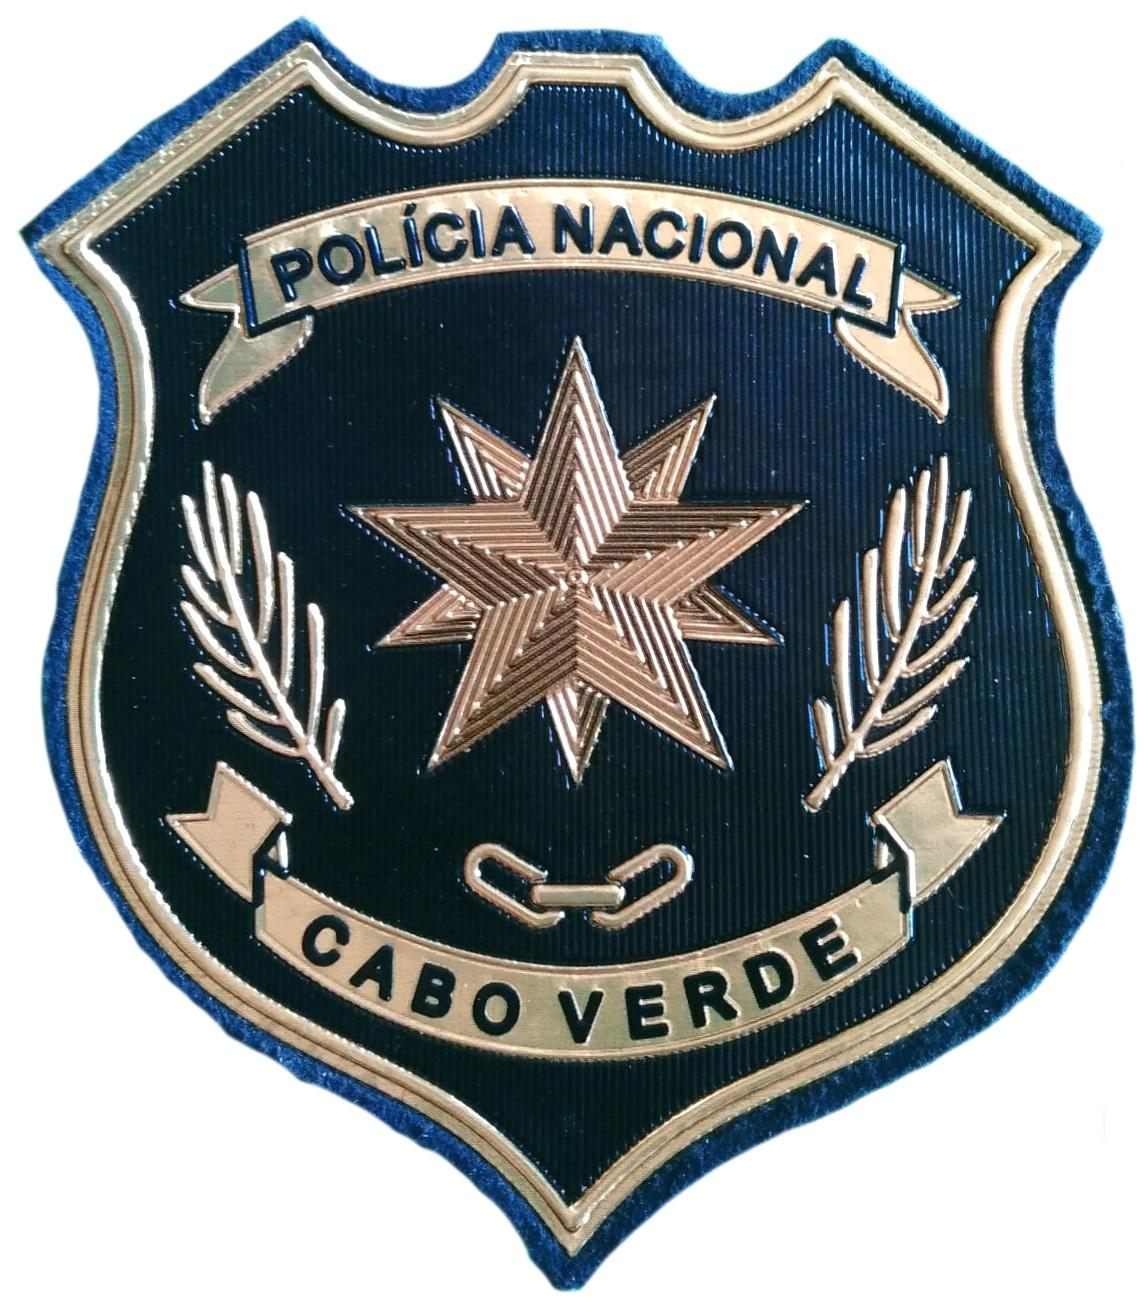 POLICÍA NACIONAL DE CABO VERDE MODELO DORADO JEFATURA PARCHE INSIGNIA EMBLEMA DISTINTIVO